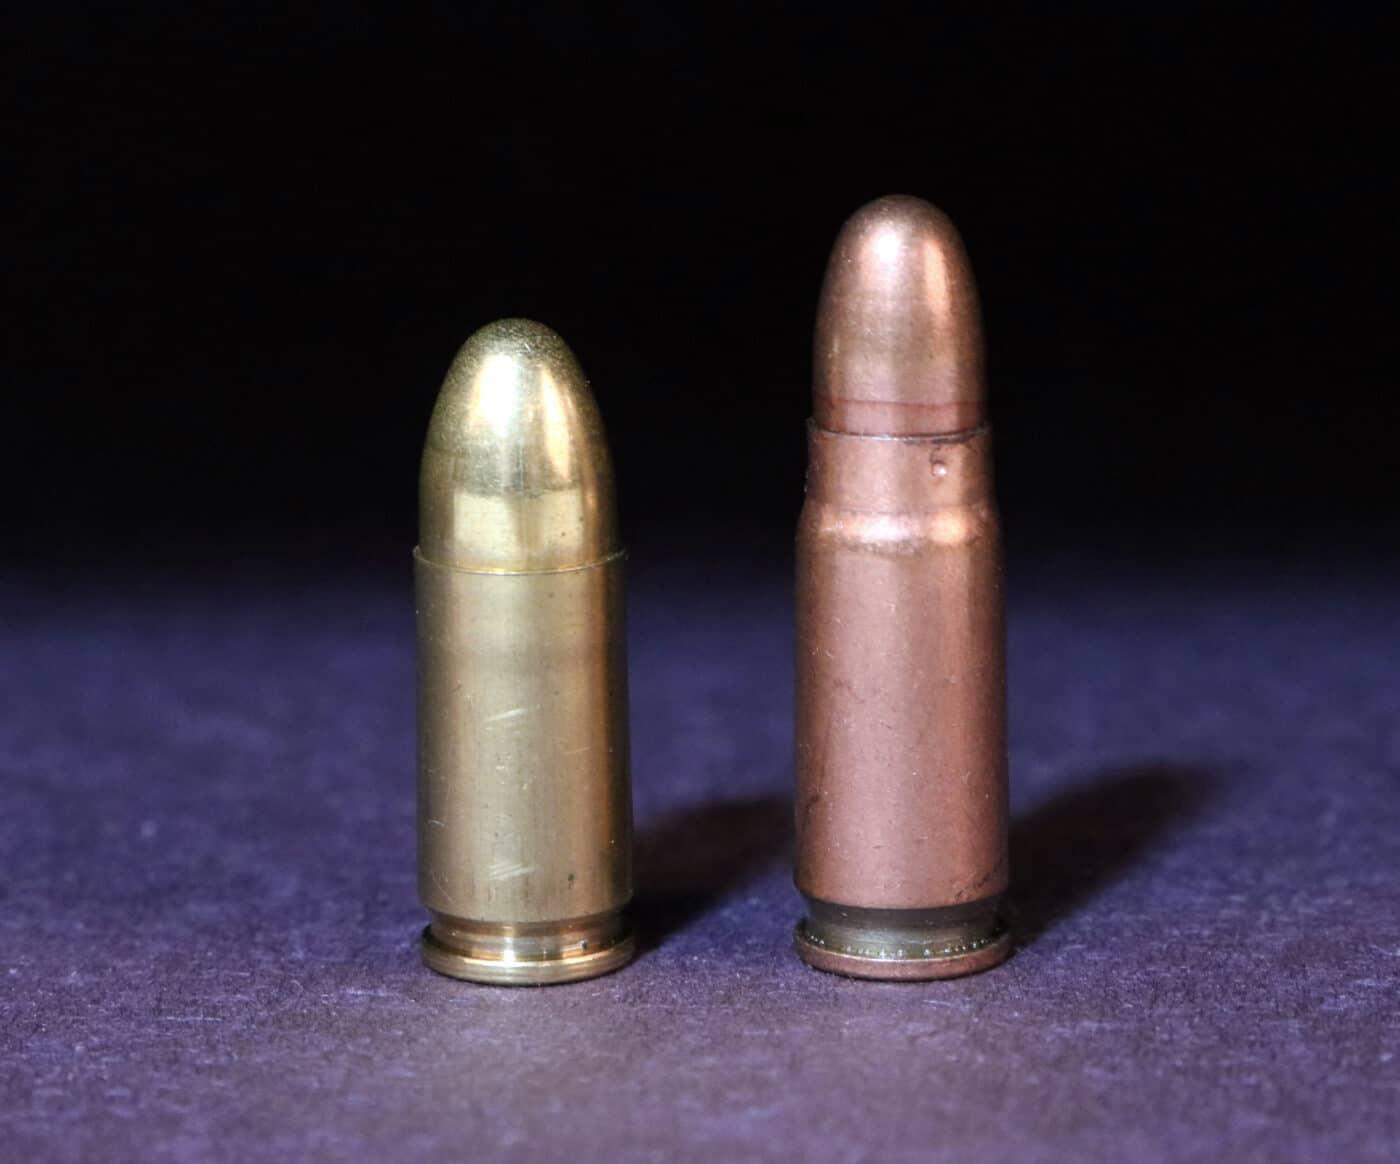 7.62x25 PPSh round vs. 9mm Parabellum